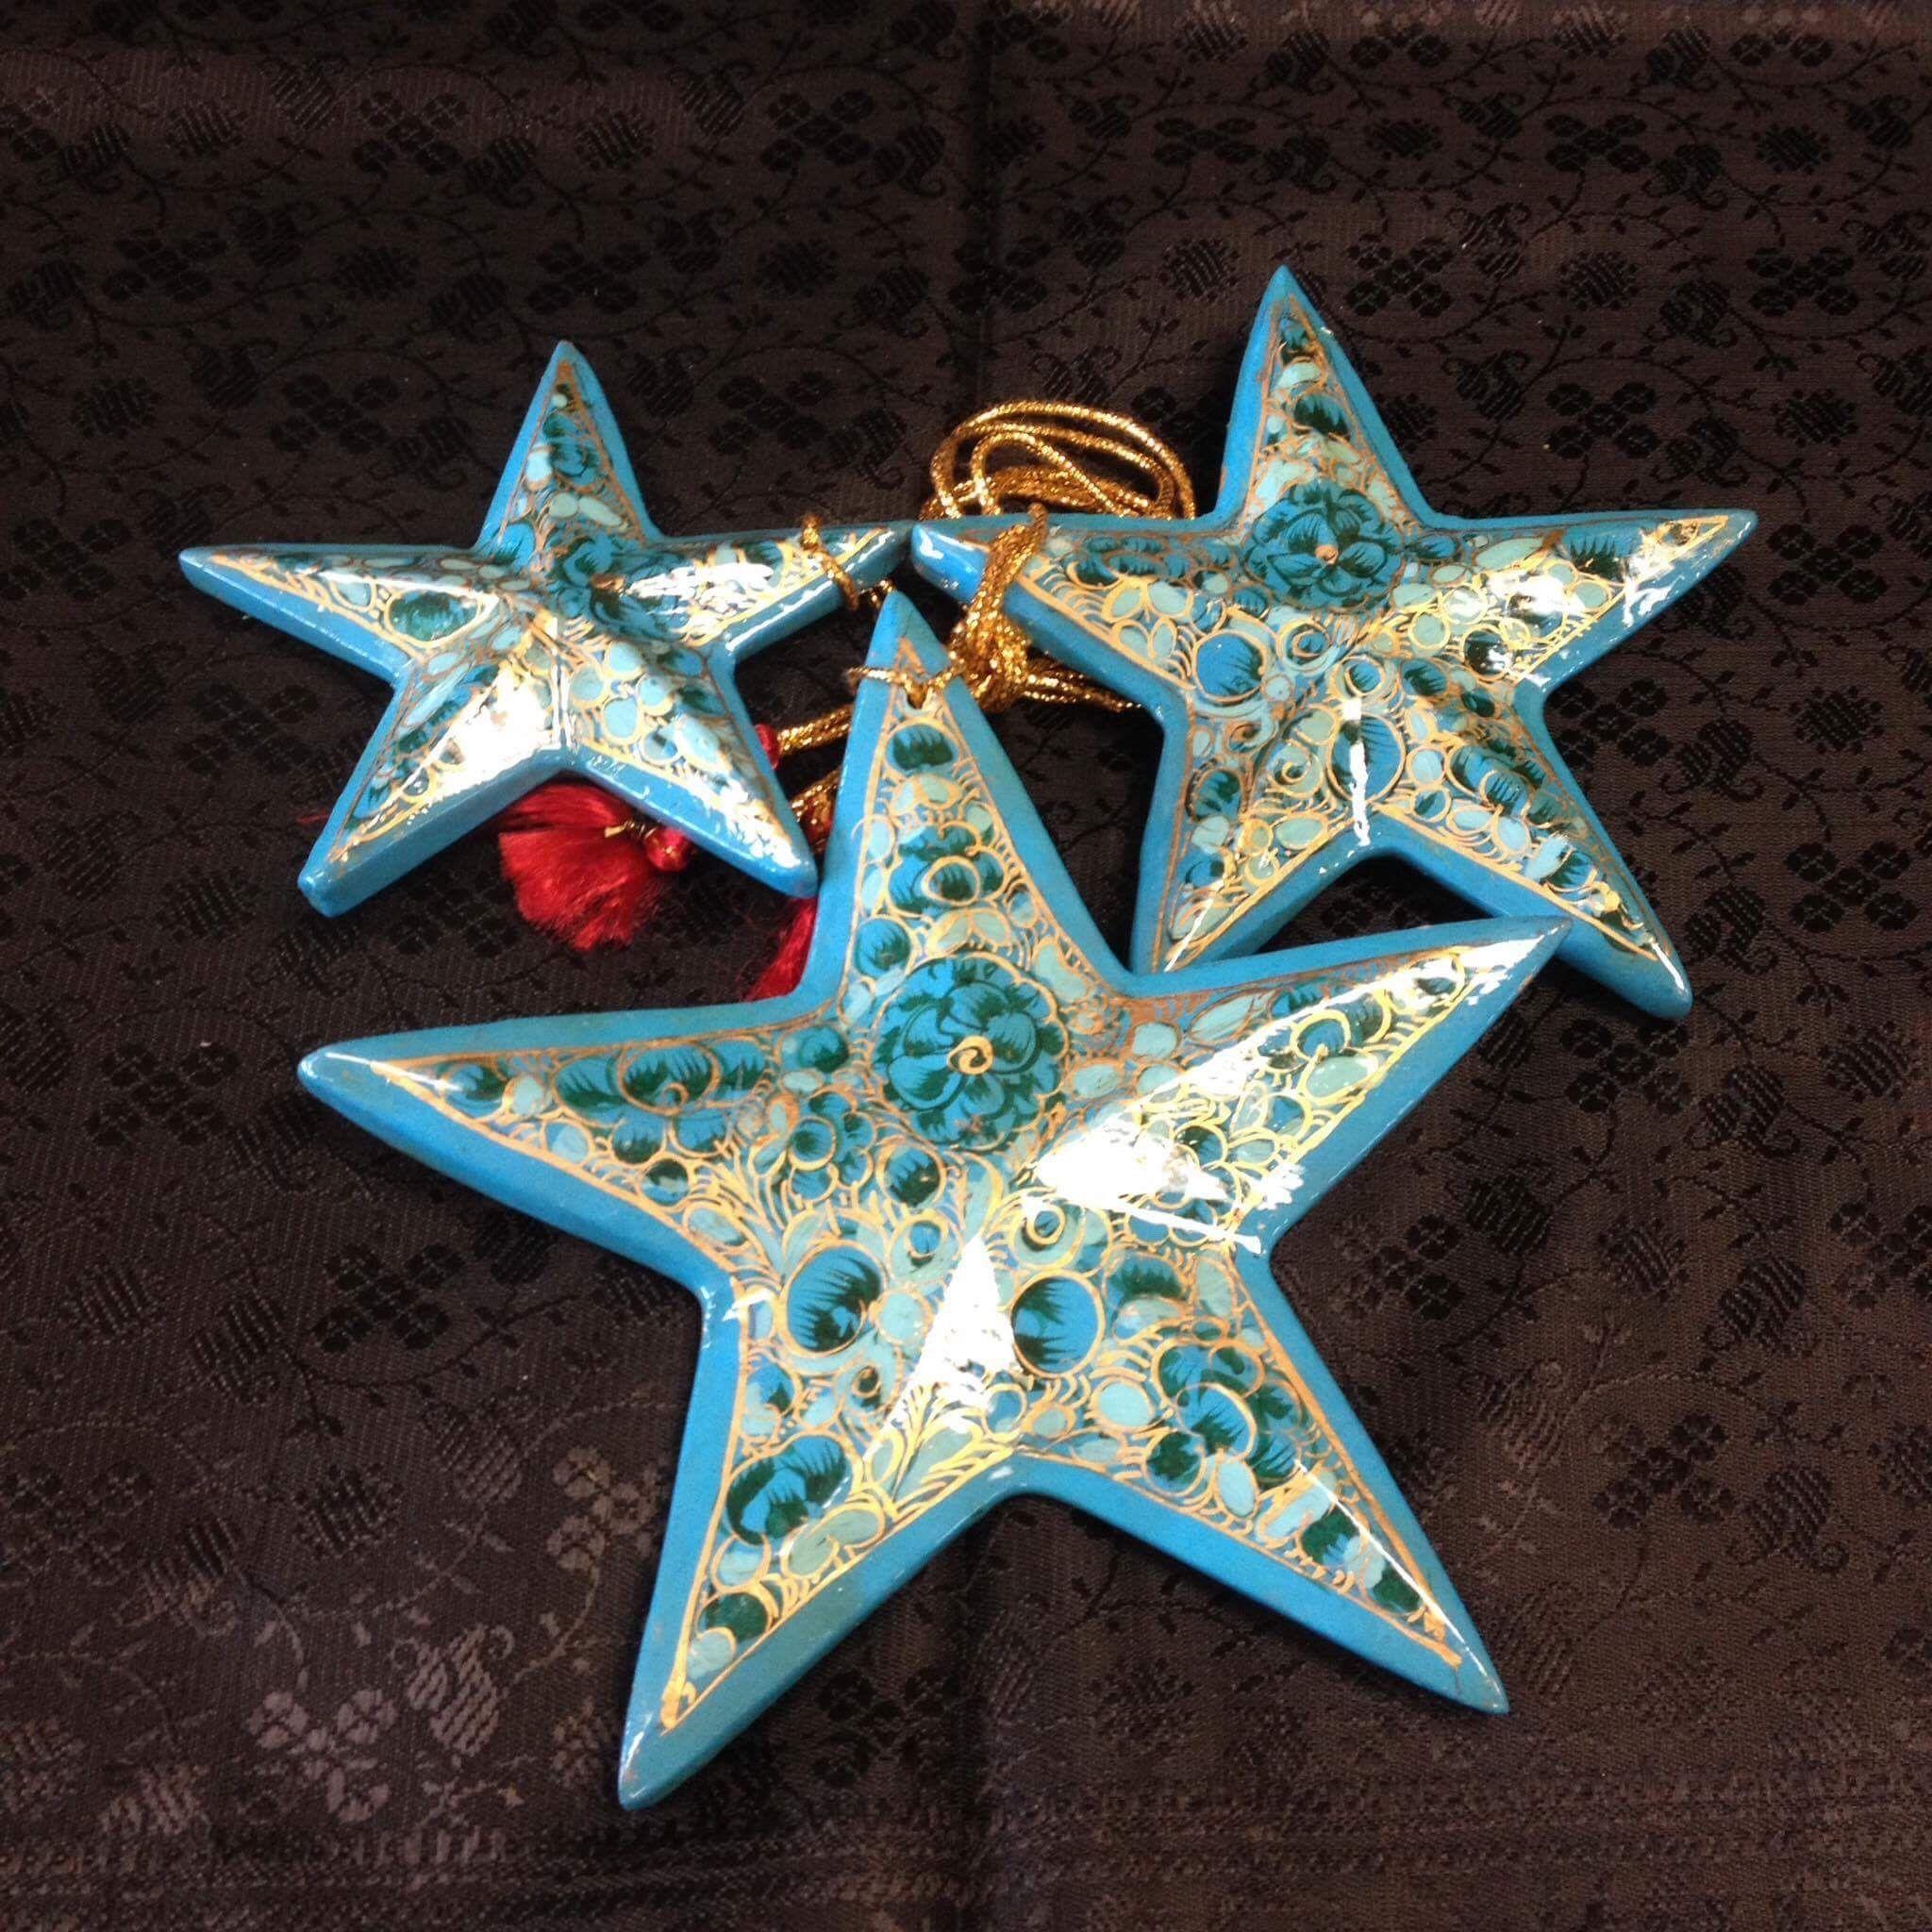 Paper Meche Christmas Ornaments